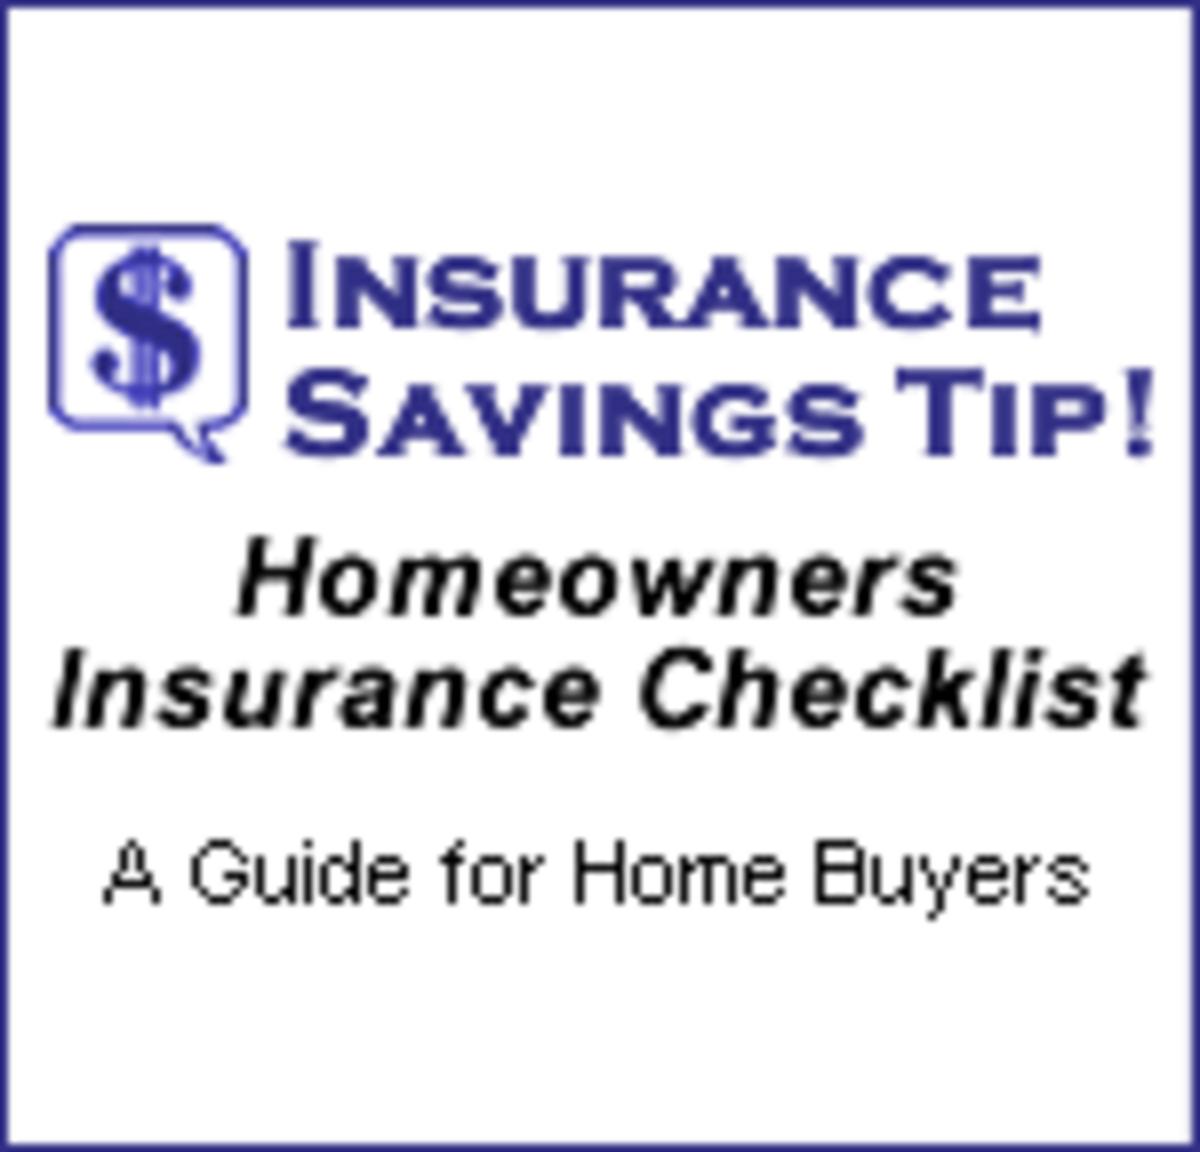 Homeowners Insurance Checklist - Insurance Savings Tip!